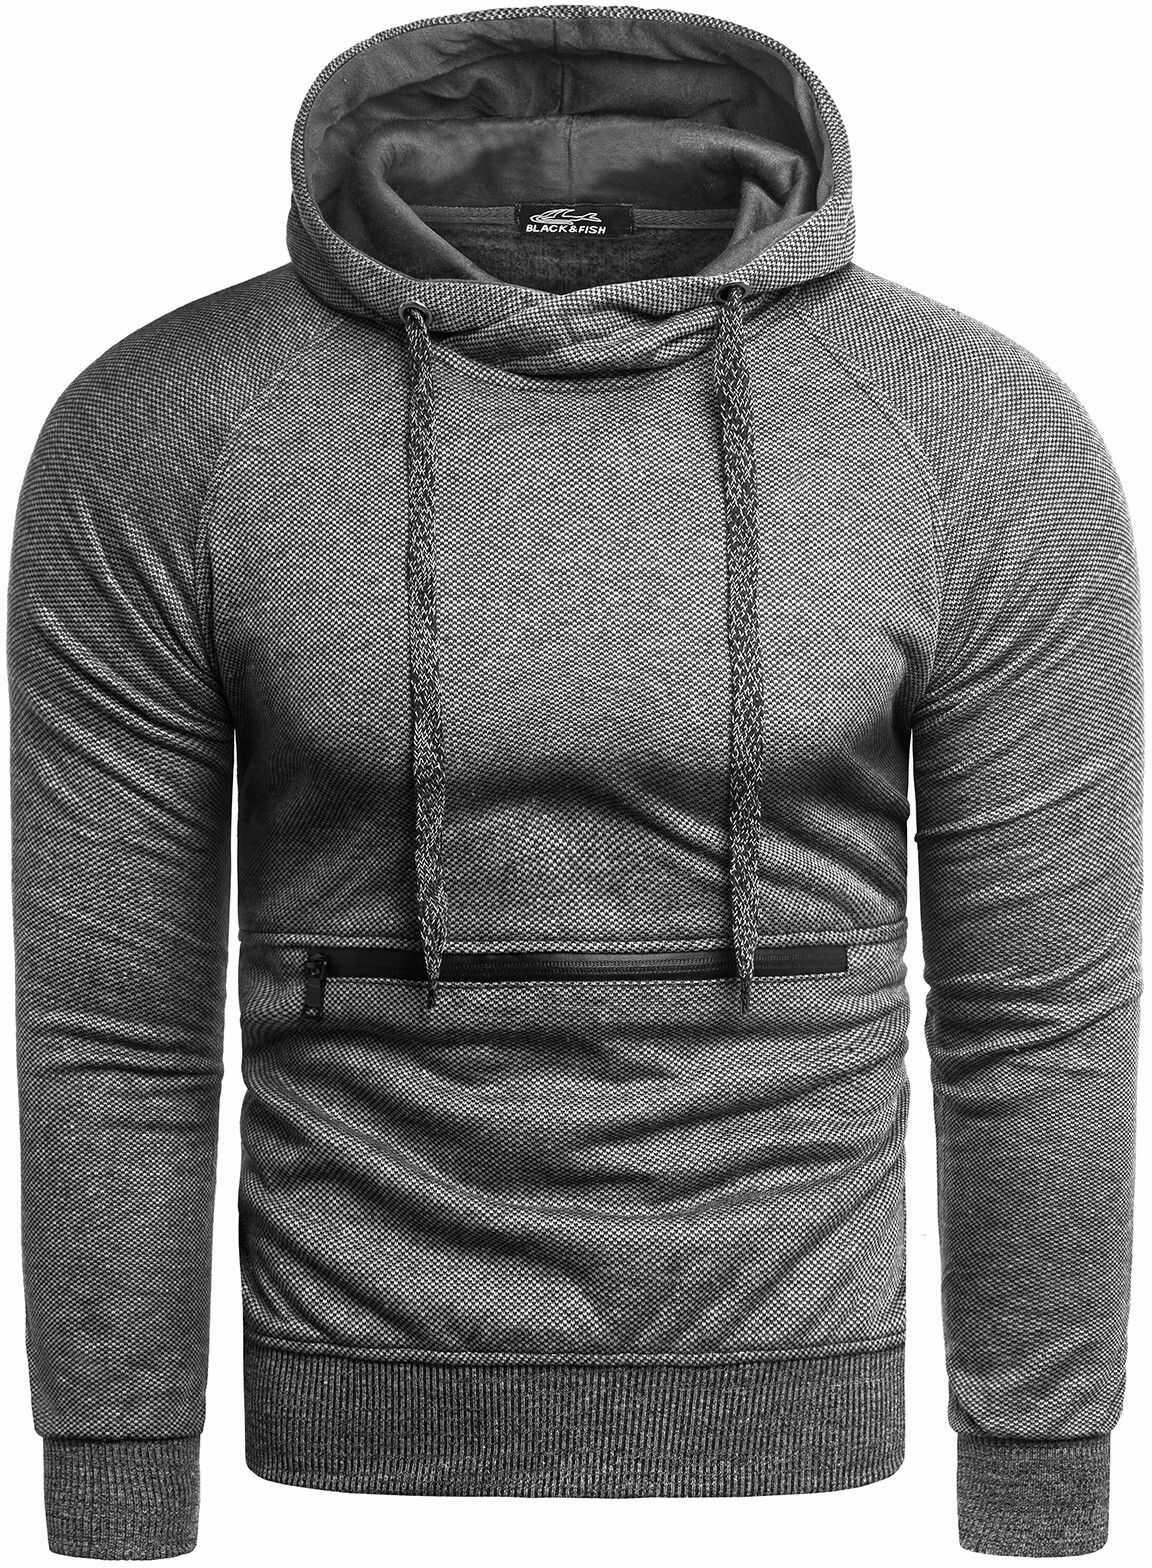 Bluza męska YP1065 - szary